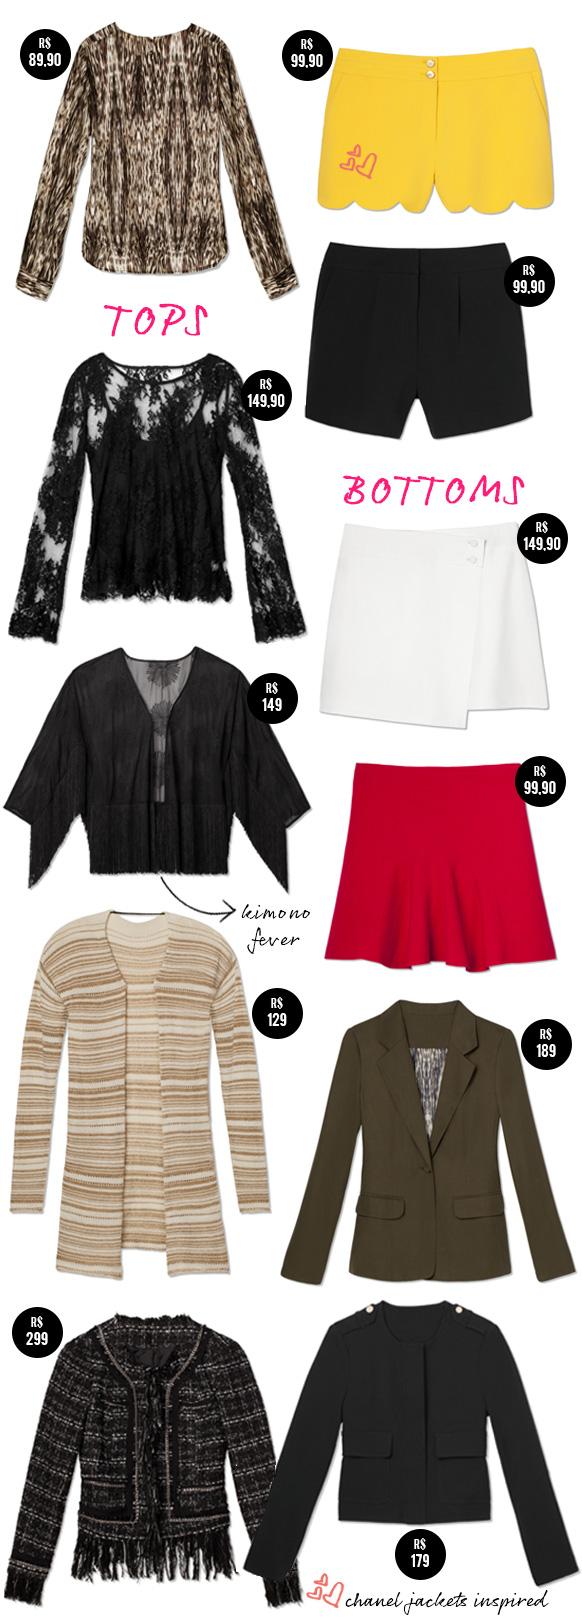 blusas-shorts-cea-nkstore